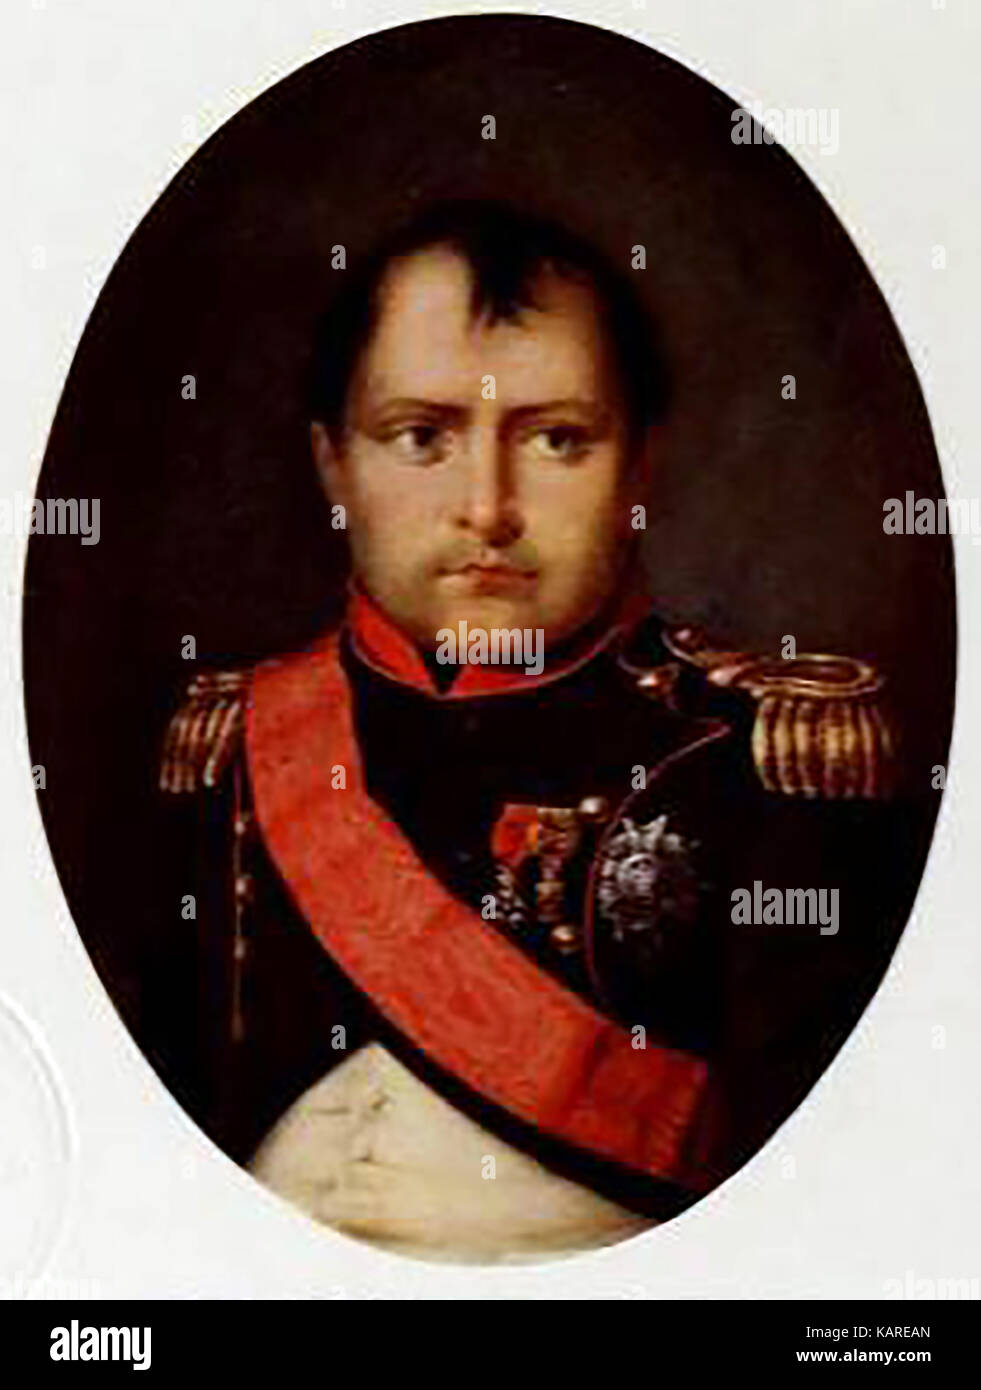 A miniature coloured portrait of napoleon Bonaparte as a young man - Stock Image